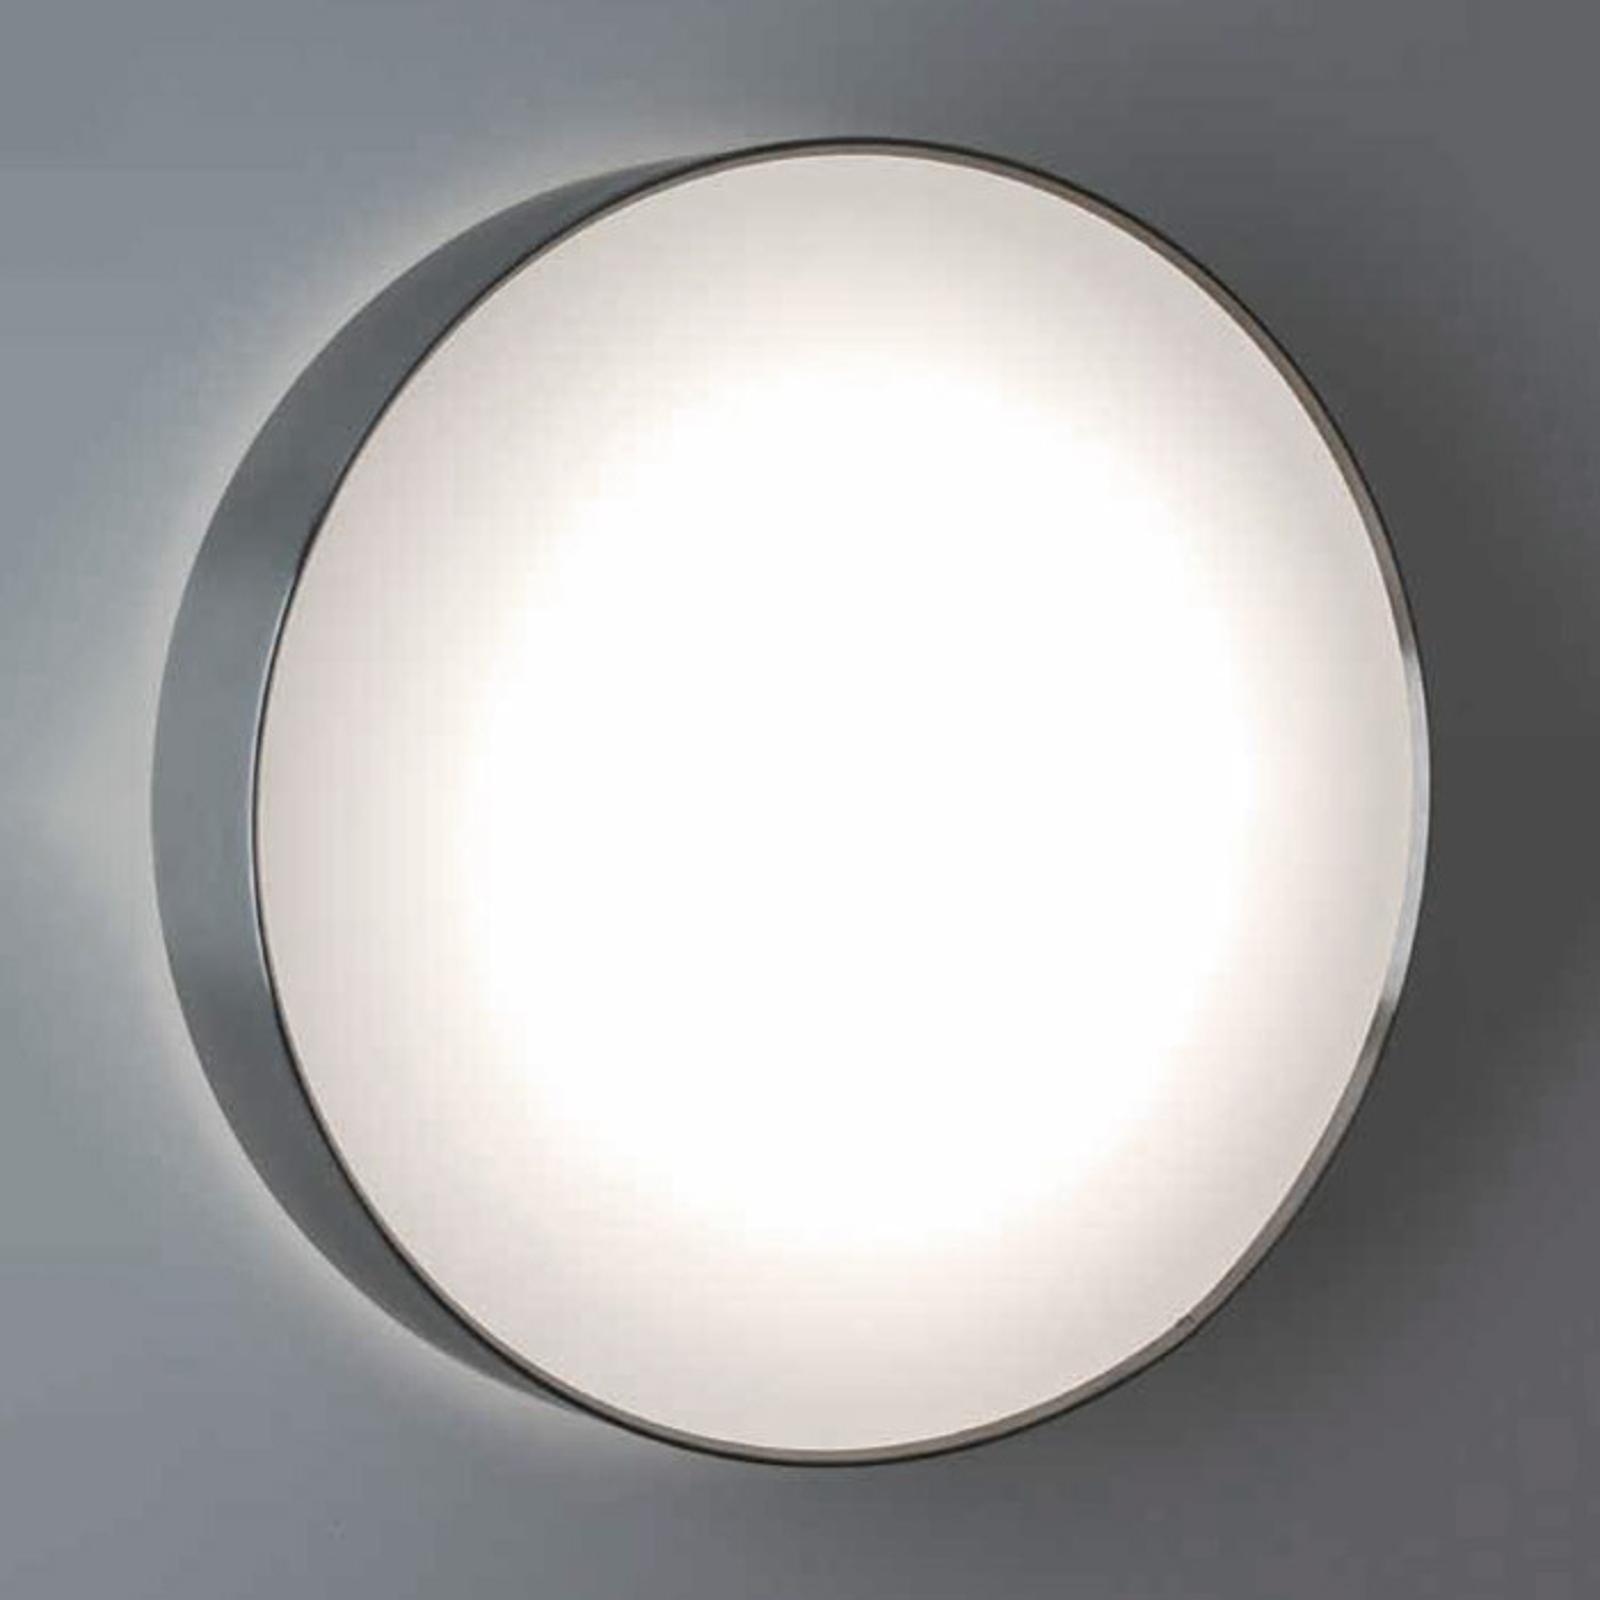 rvs plafondlamp SUN 4 LED 13 W 4 K